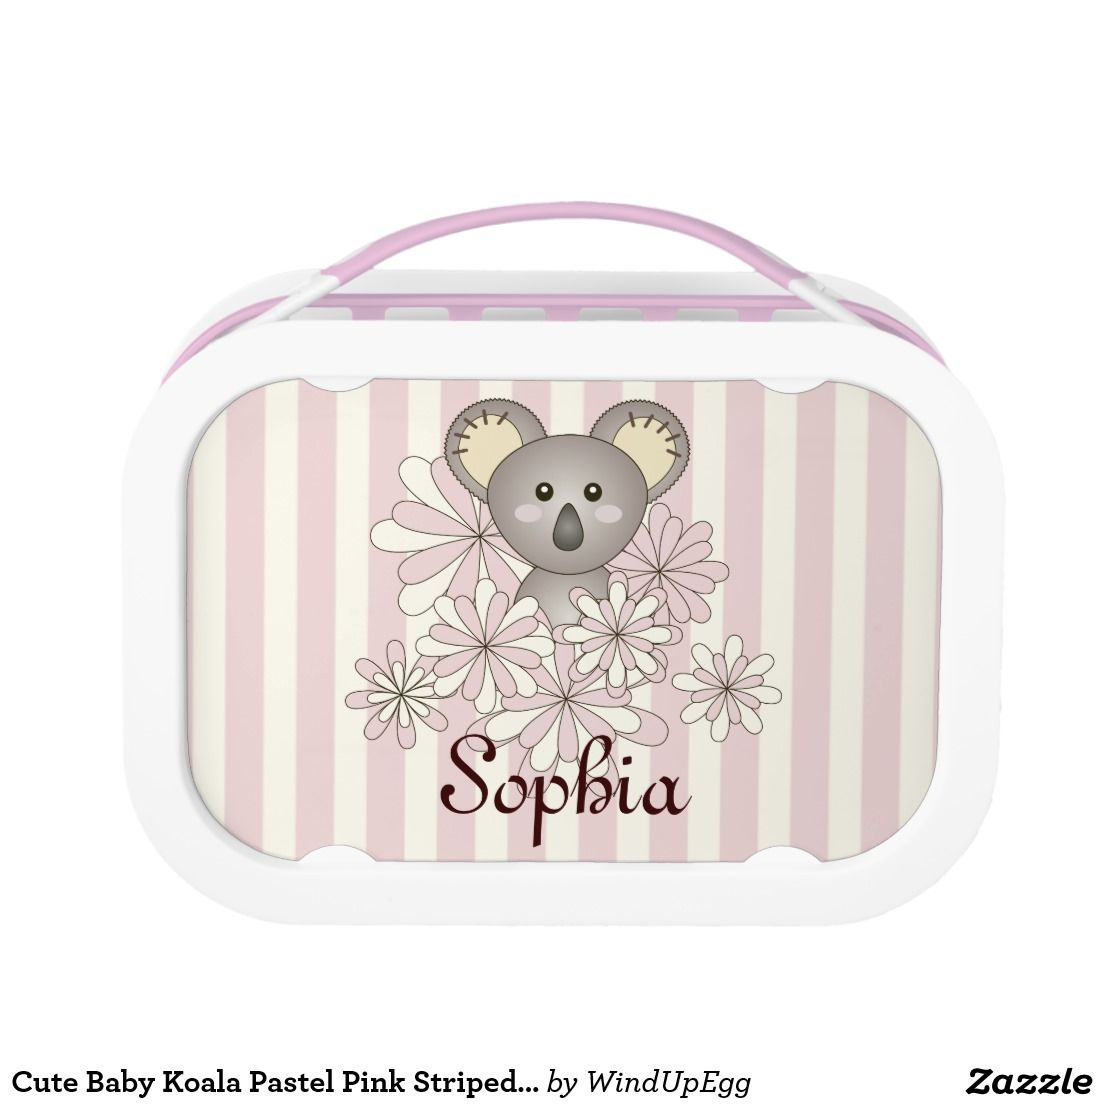 Cute Baby Koala Pastel Pink Striped Kids Name Yubo Lunch Box Lunch Box Cool Lunch Boxes Baby Koala